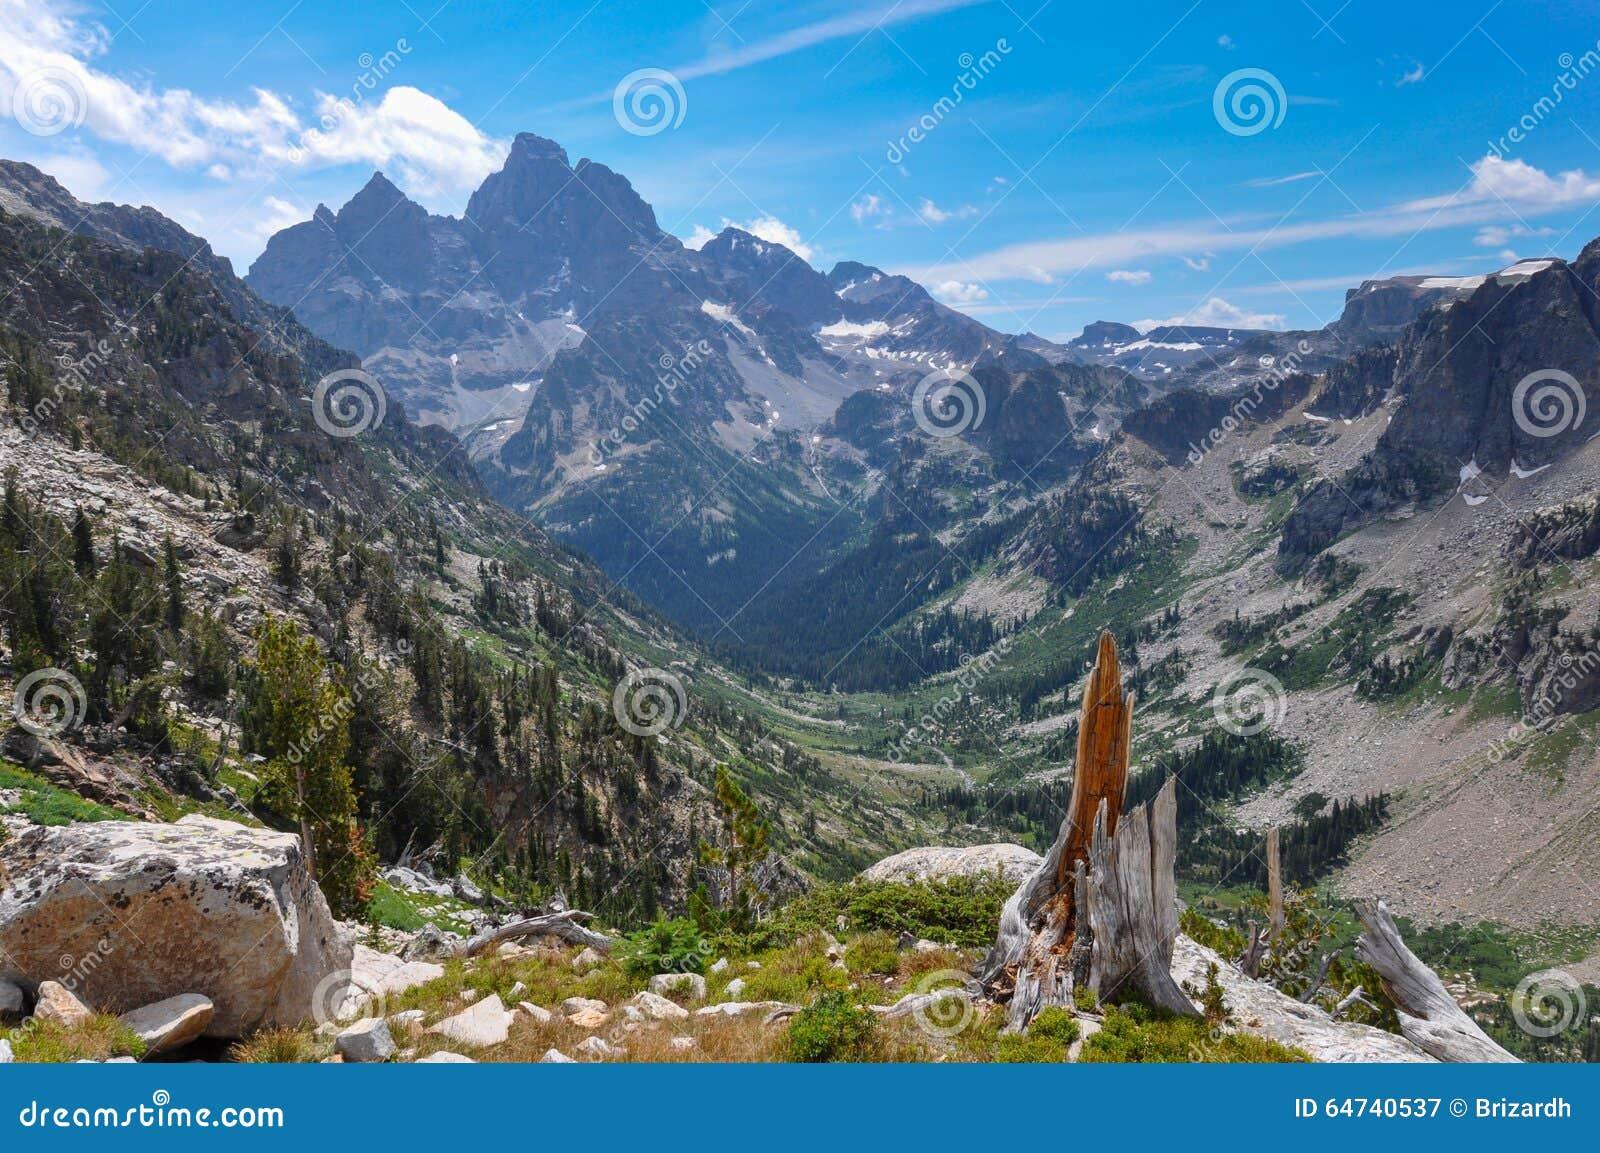 Paintbrush Canyon Trail in Grand Tetons National Park, Wyoming,